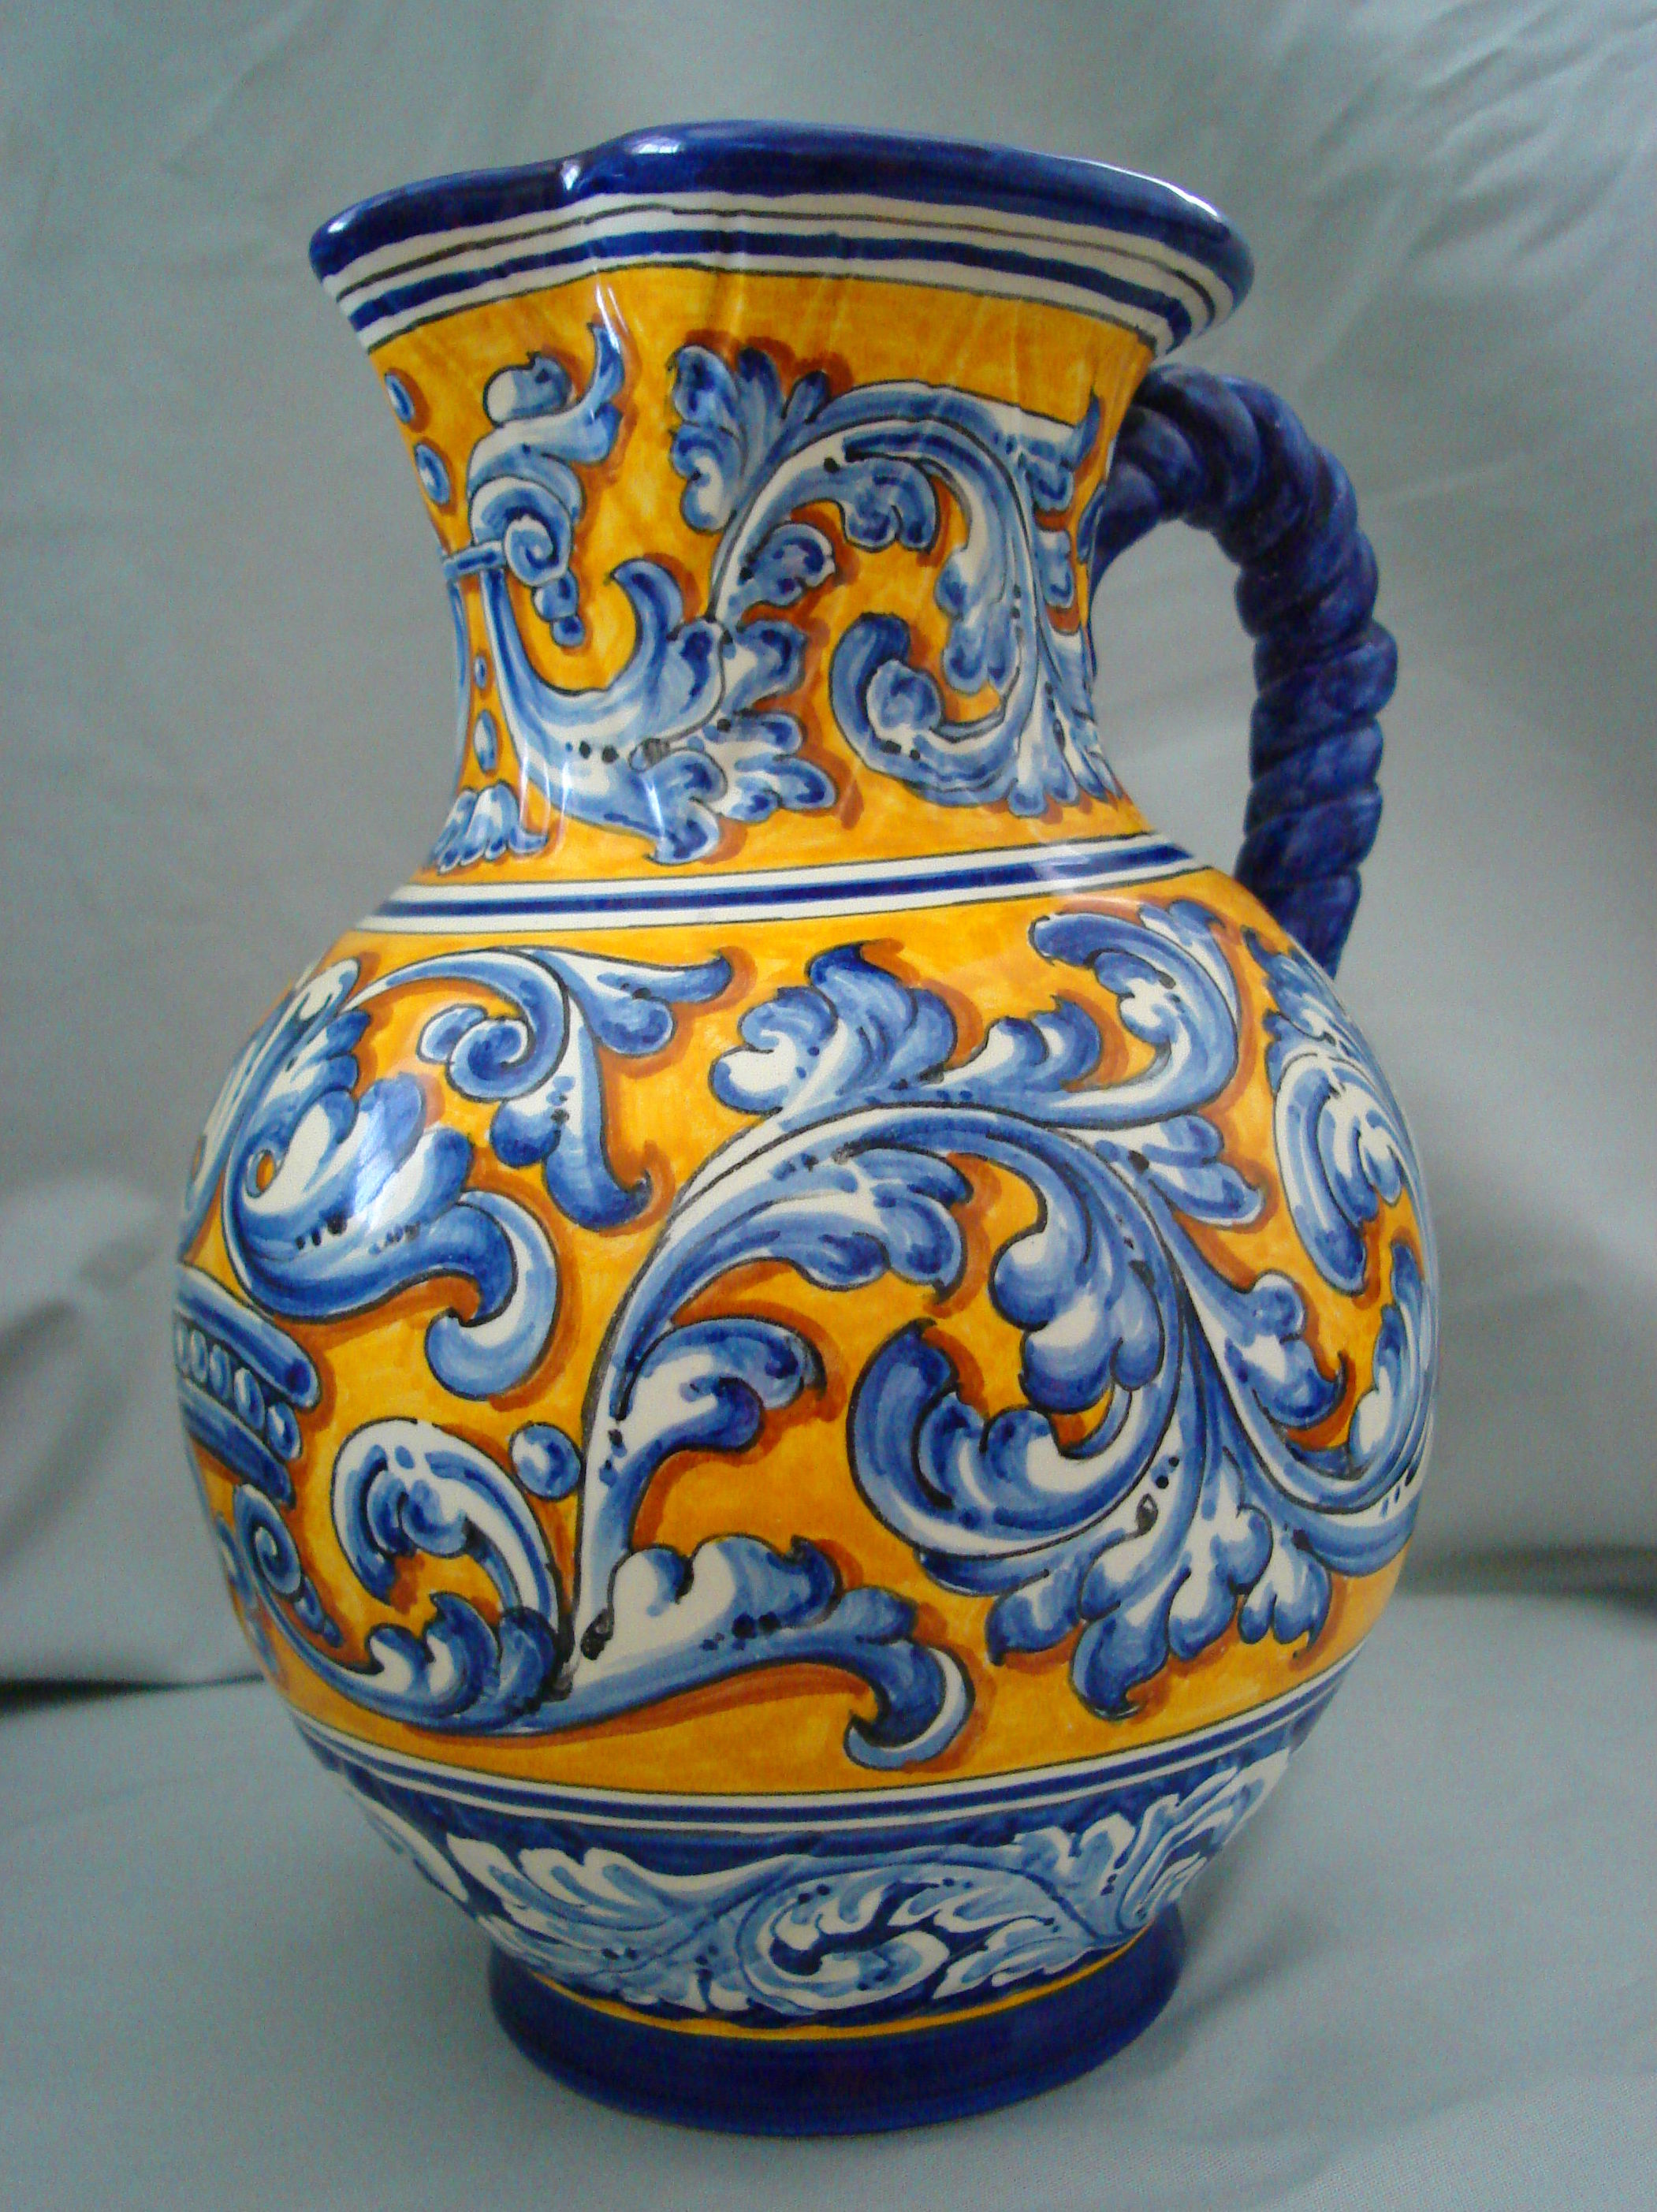 Foto 8 de cer mica art stica y popular en talavera de la reina cer mica nicol s varas d az - Fotos de ceramica ...